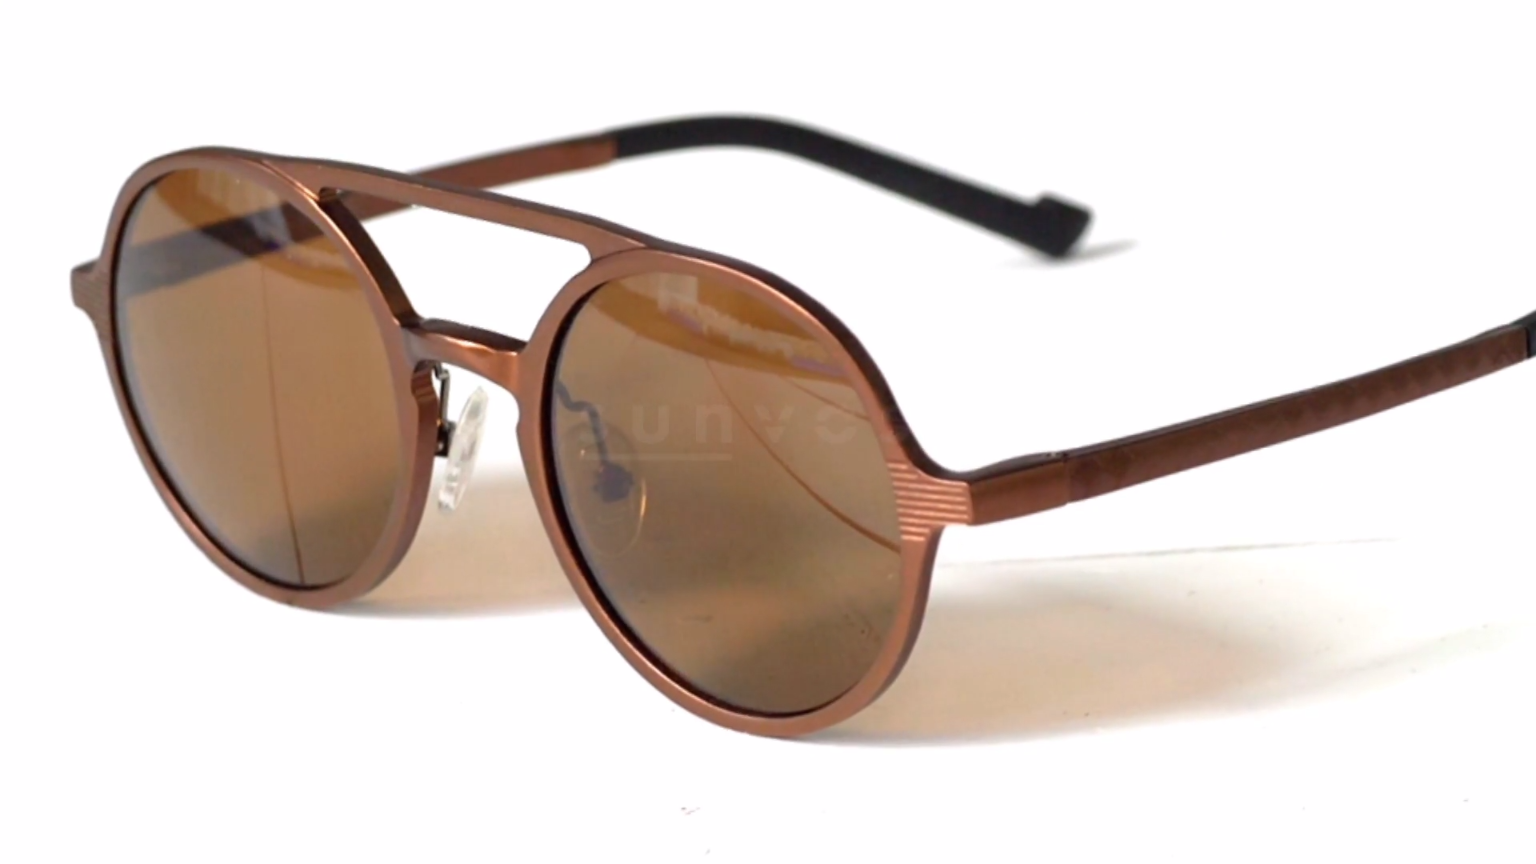 bcce5310f4 Keeper Sunglasse - SunVoss.com - Unique Sunglasses